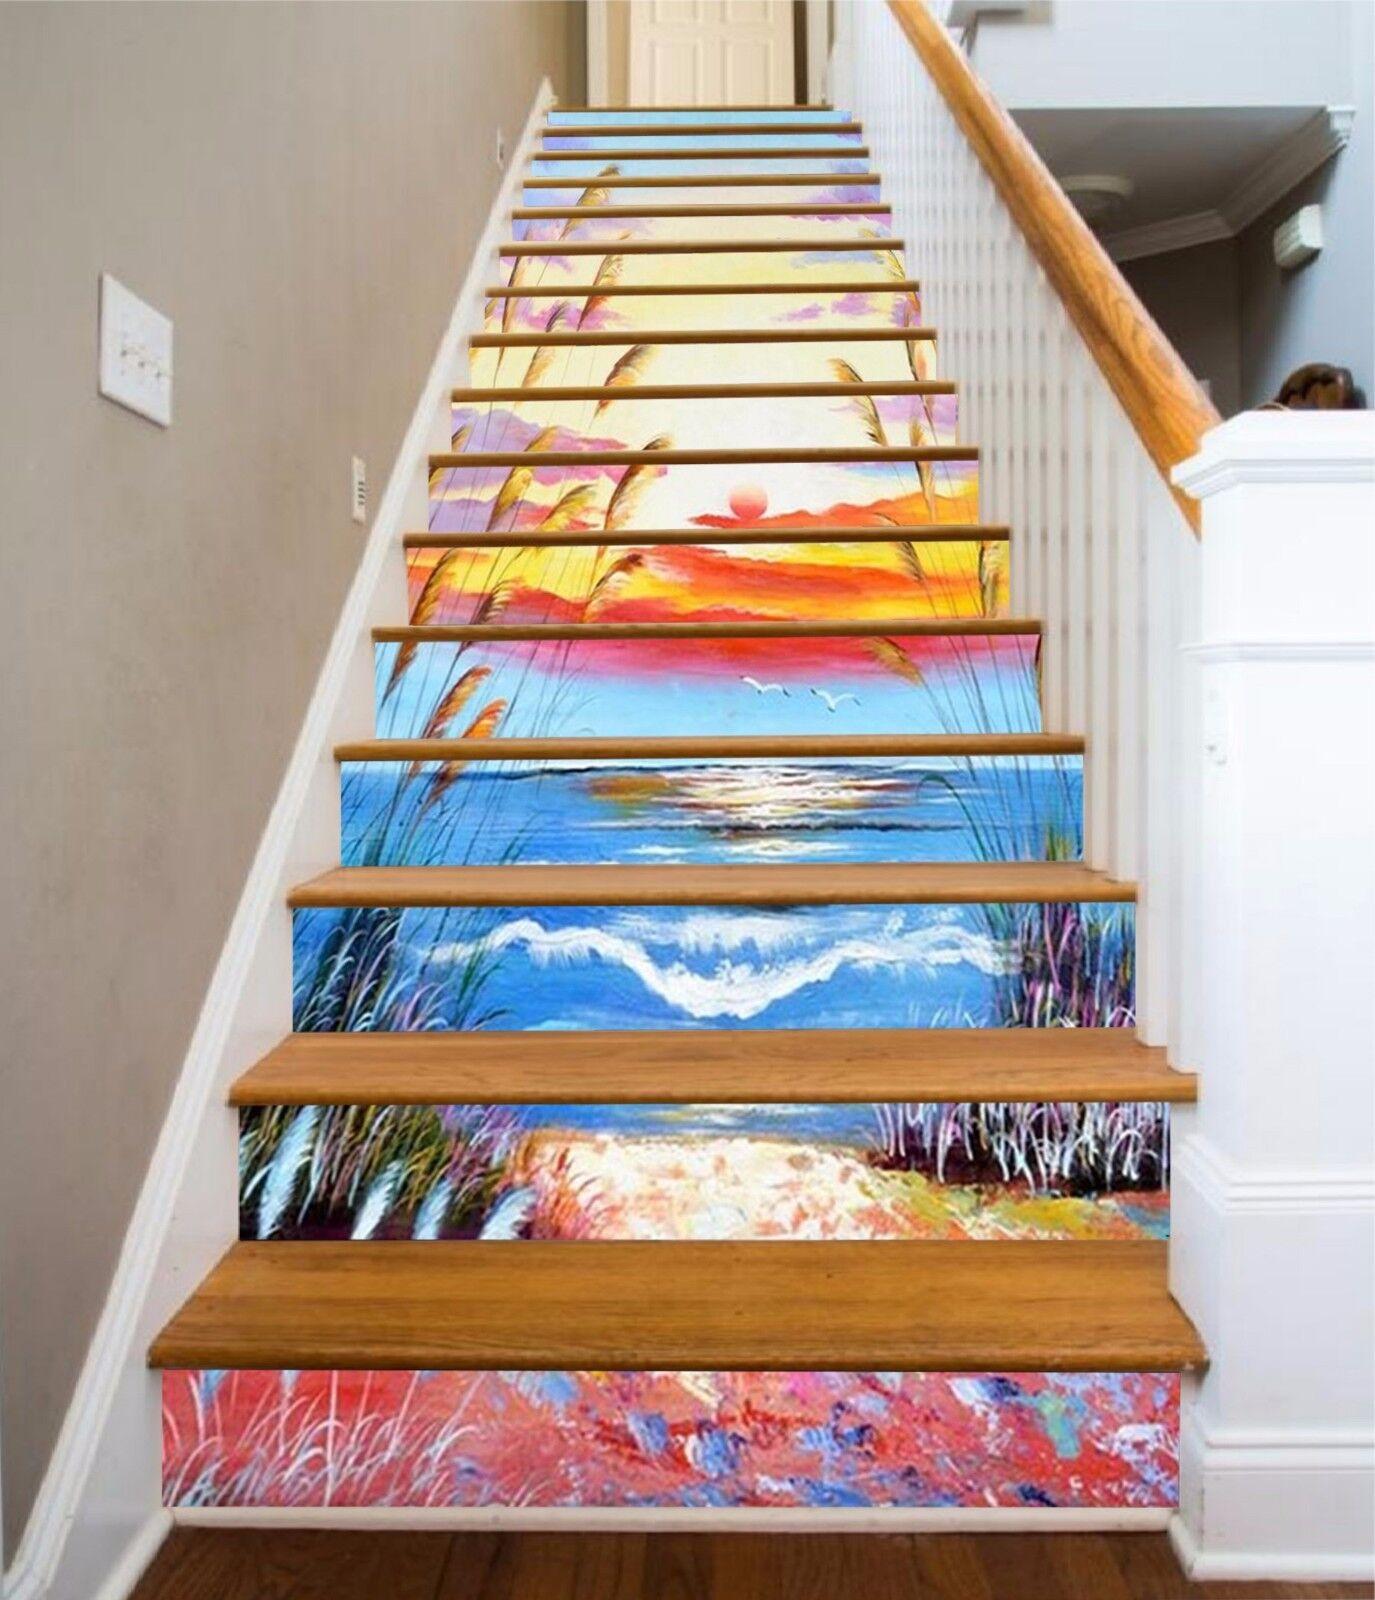 3D Sunset Glow 610 Stair Risers Decoration Photo Mural Vinyl Decal Wallpaper UK